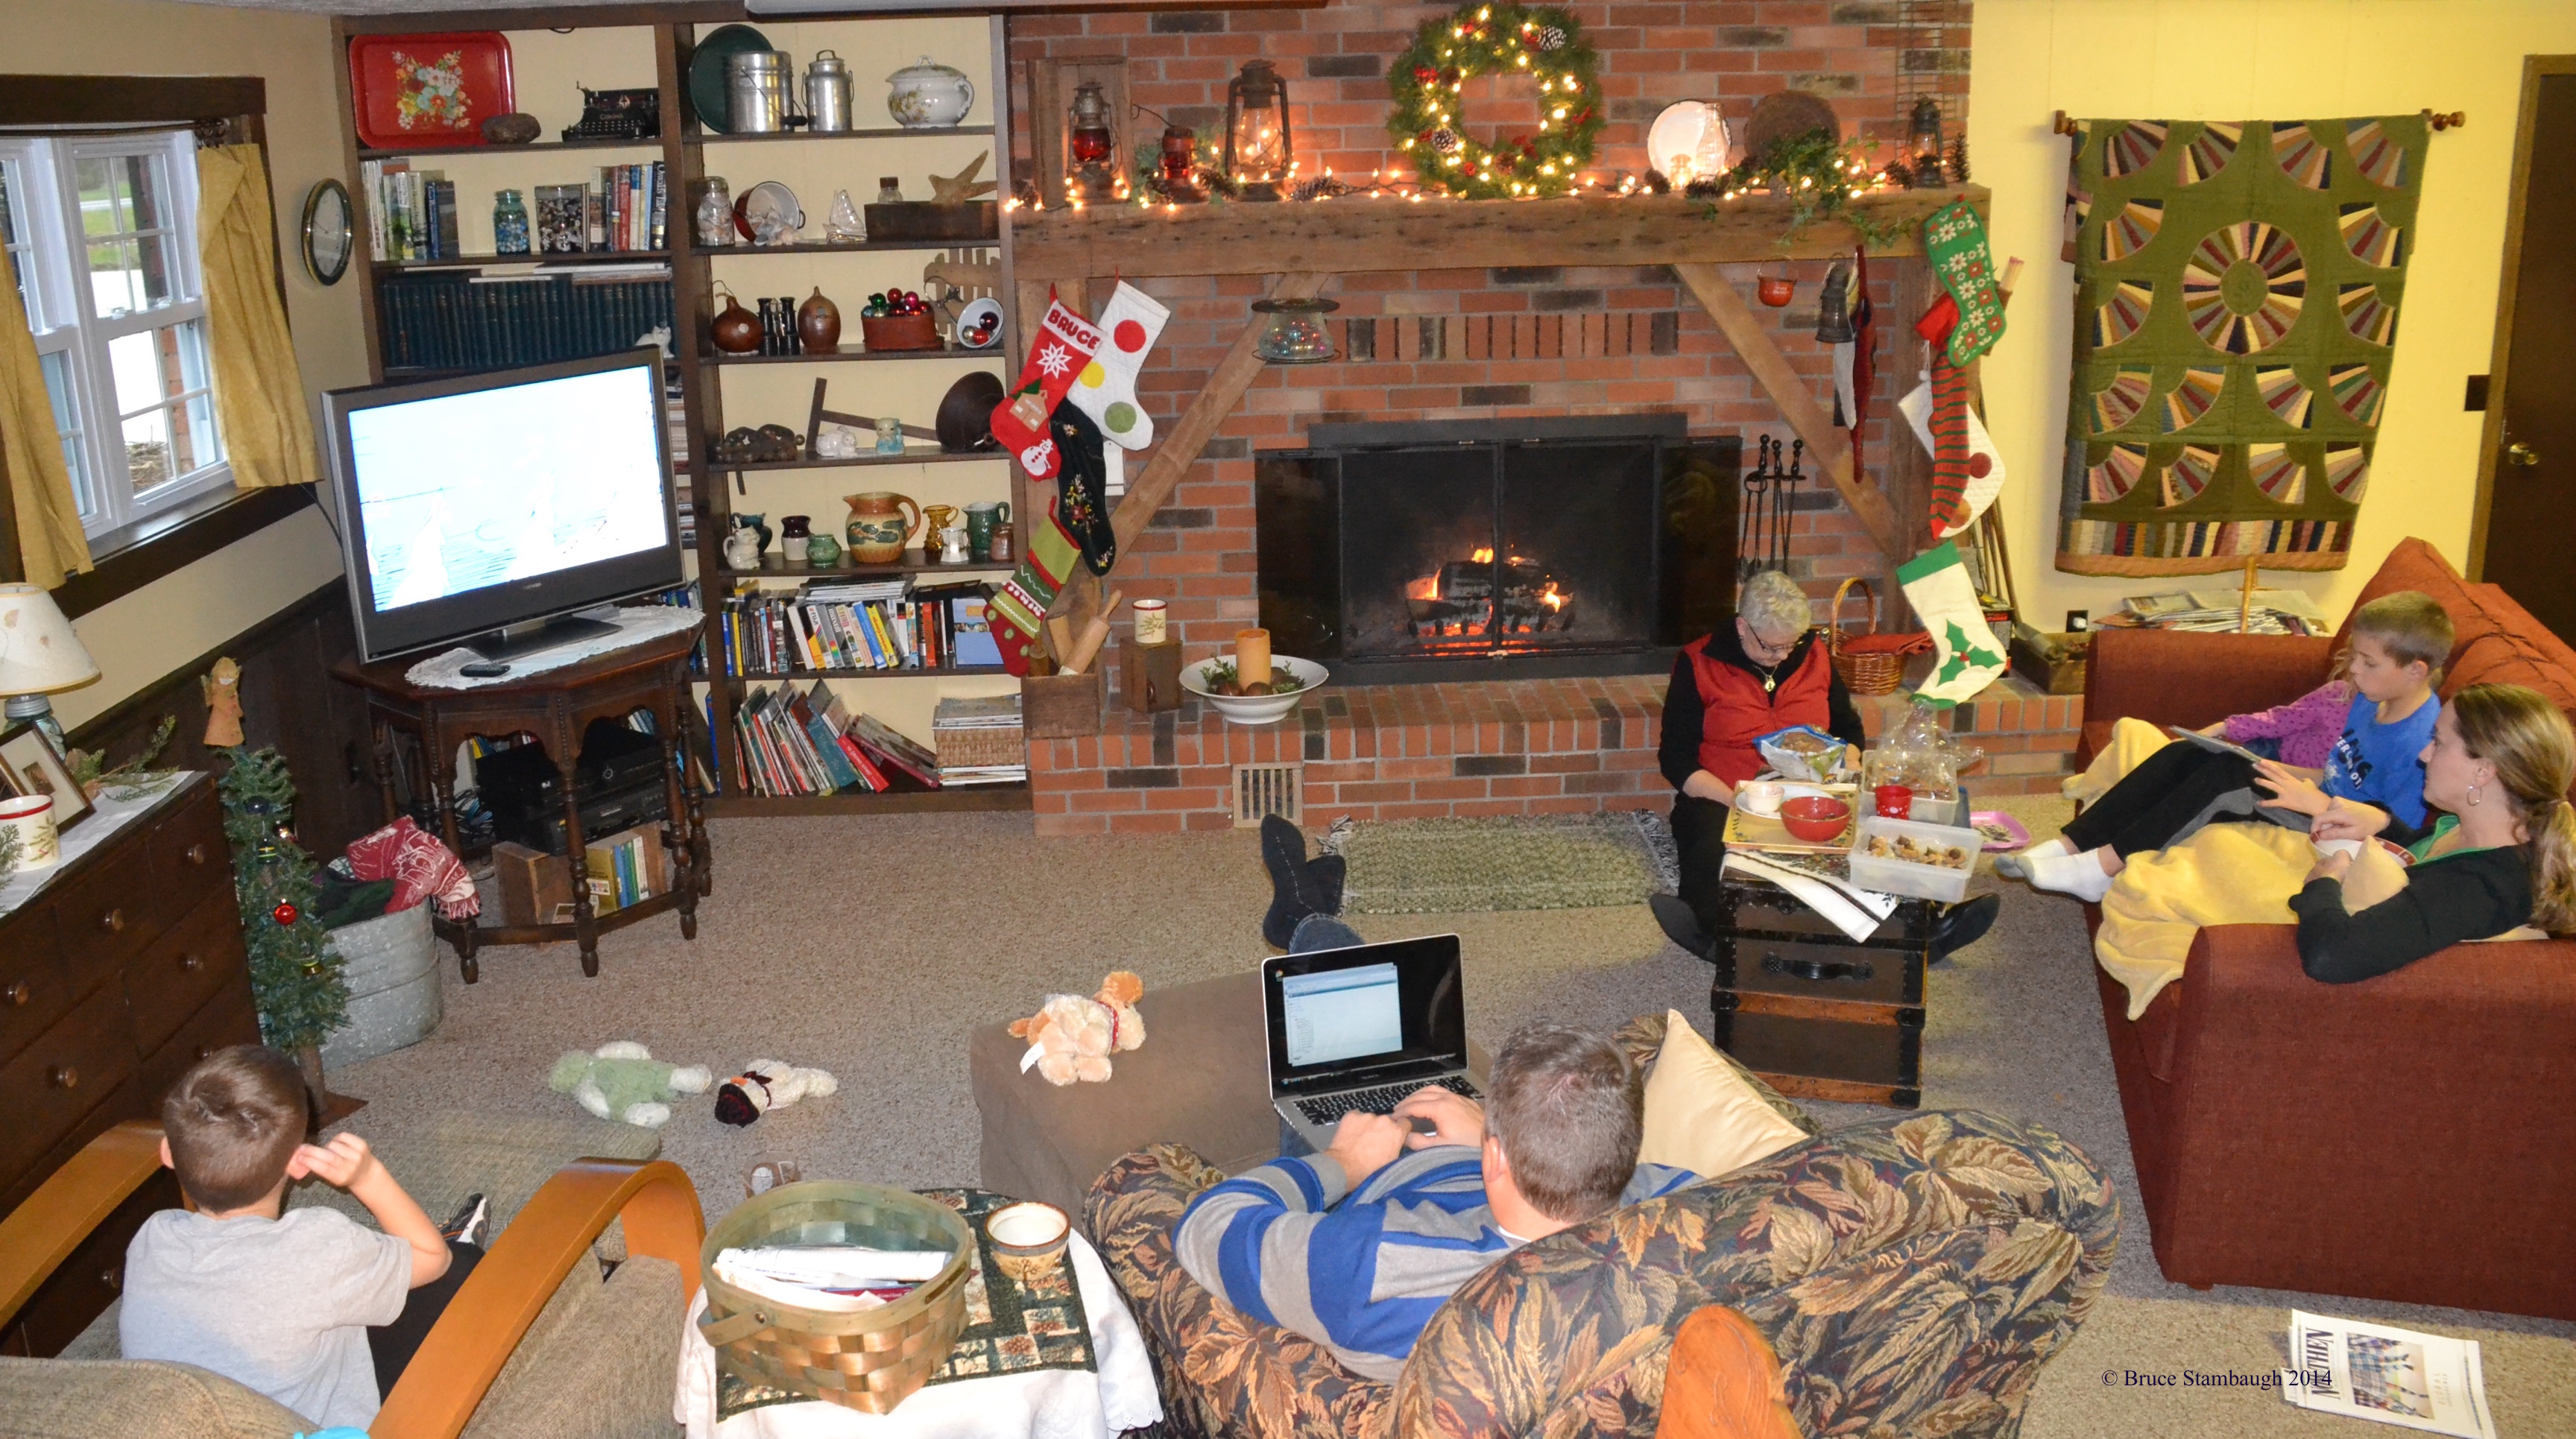 family, Christmas, family holiday gathering